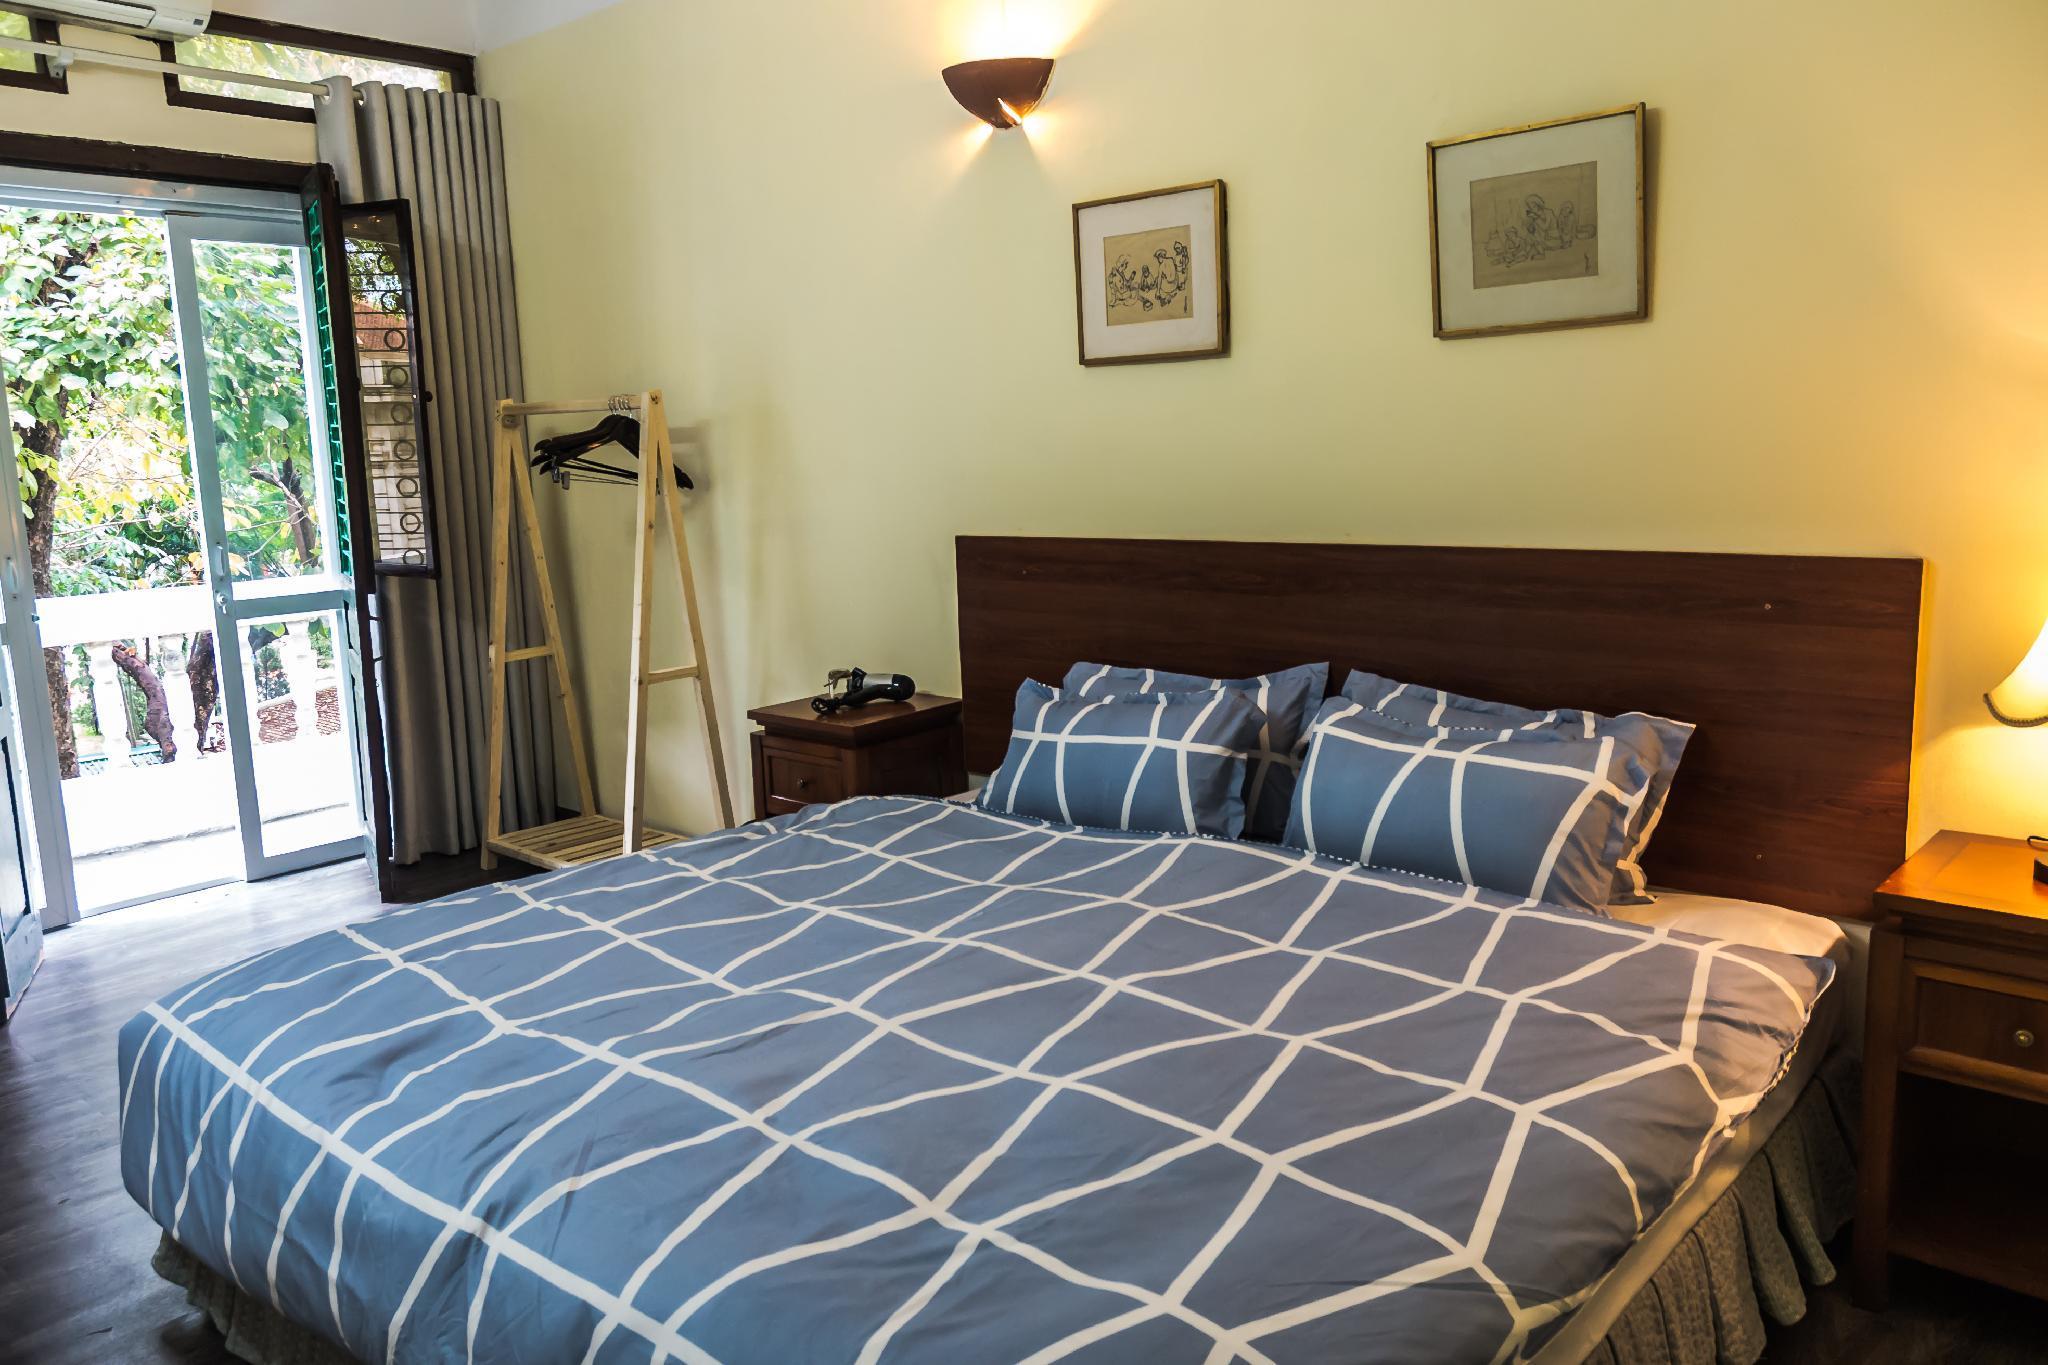 Attic 2bedroom Hoan Kiem Home Stay